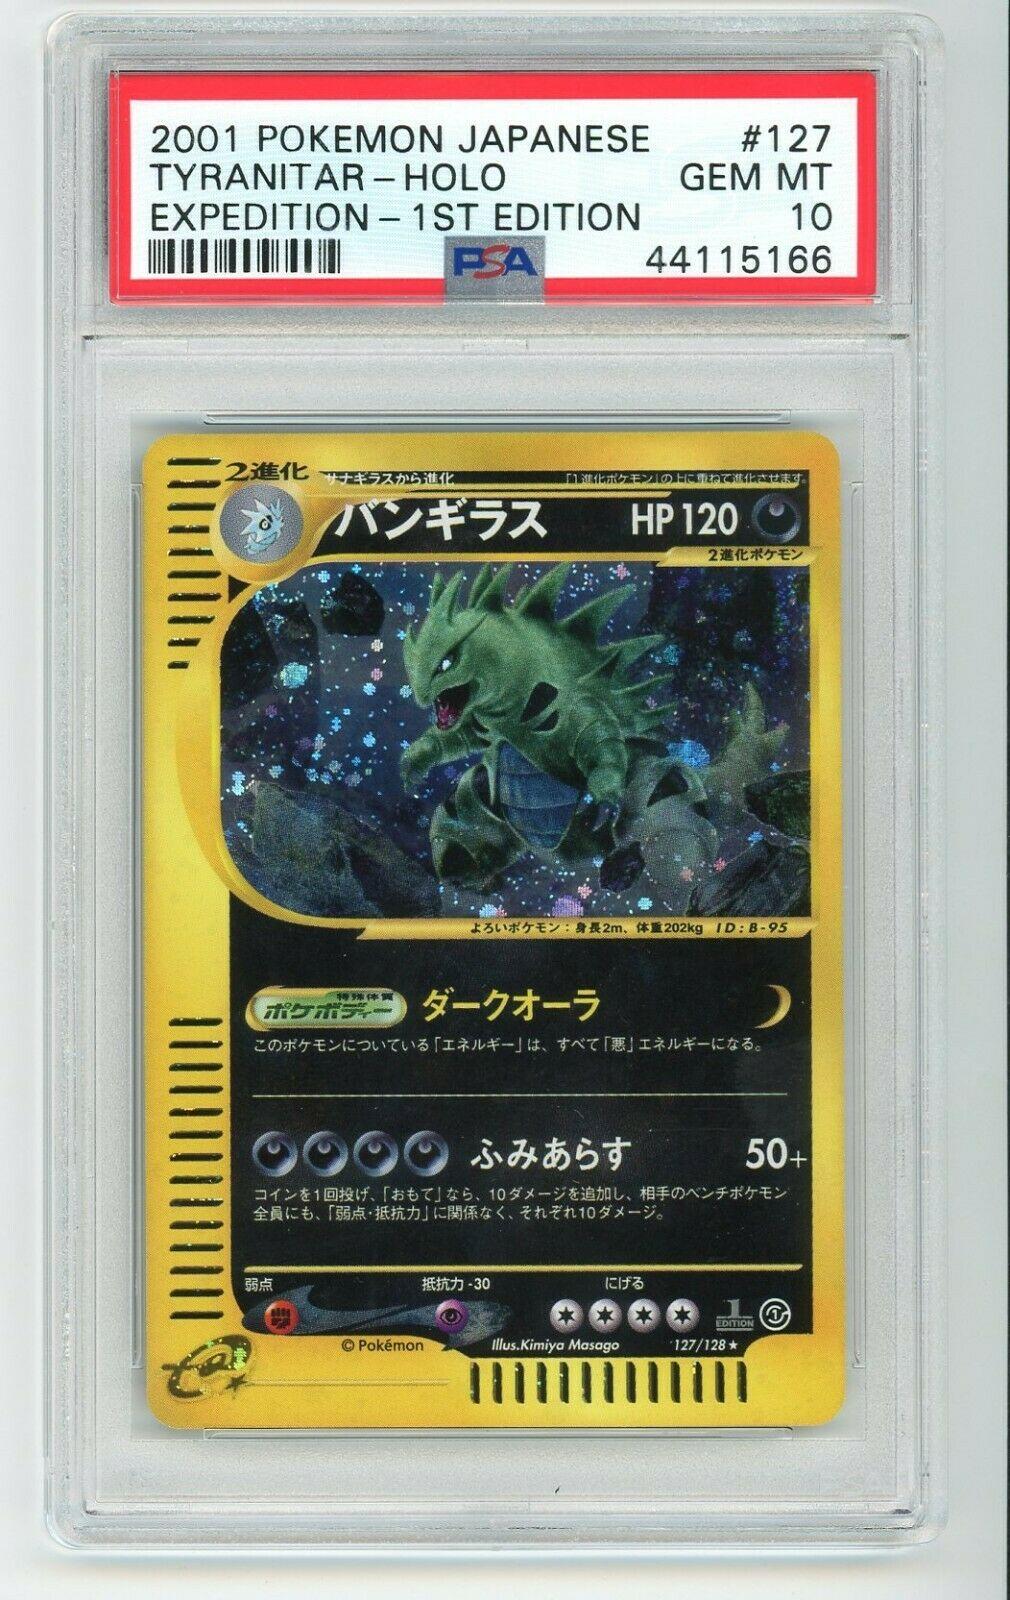 PSA 10 POKEMON JAPANESE CARD EXPEDITION 1ST EDITION TYRANITAR  2001 127128